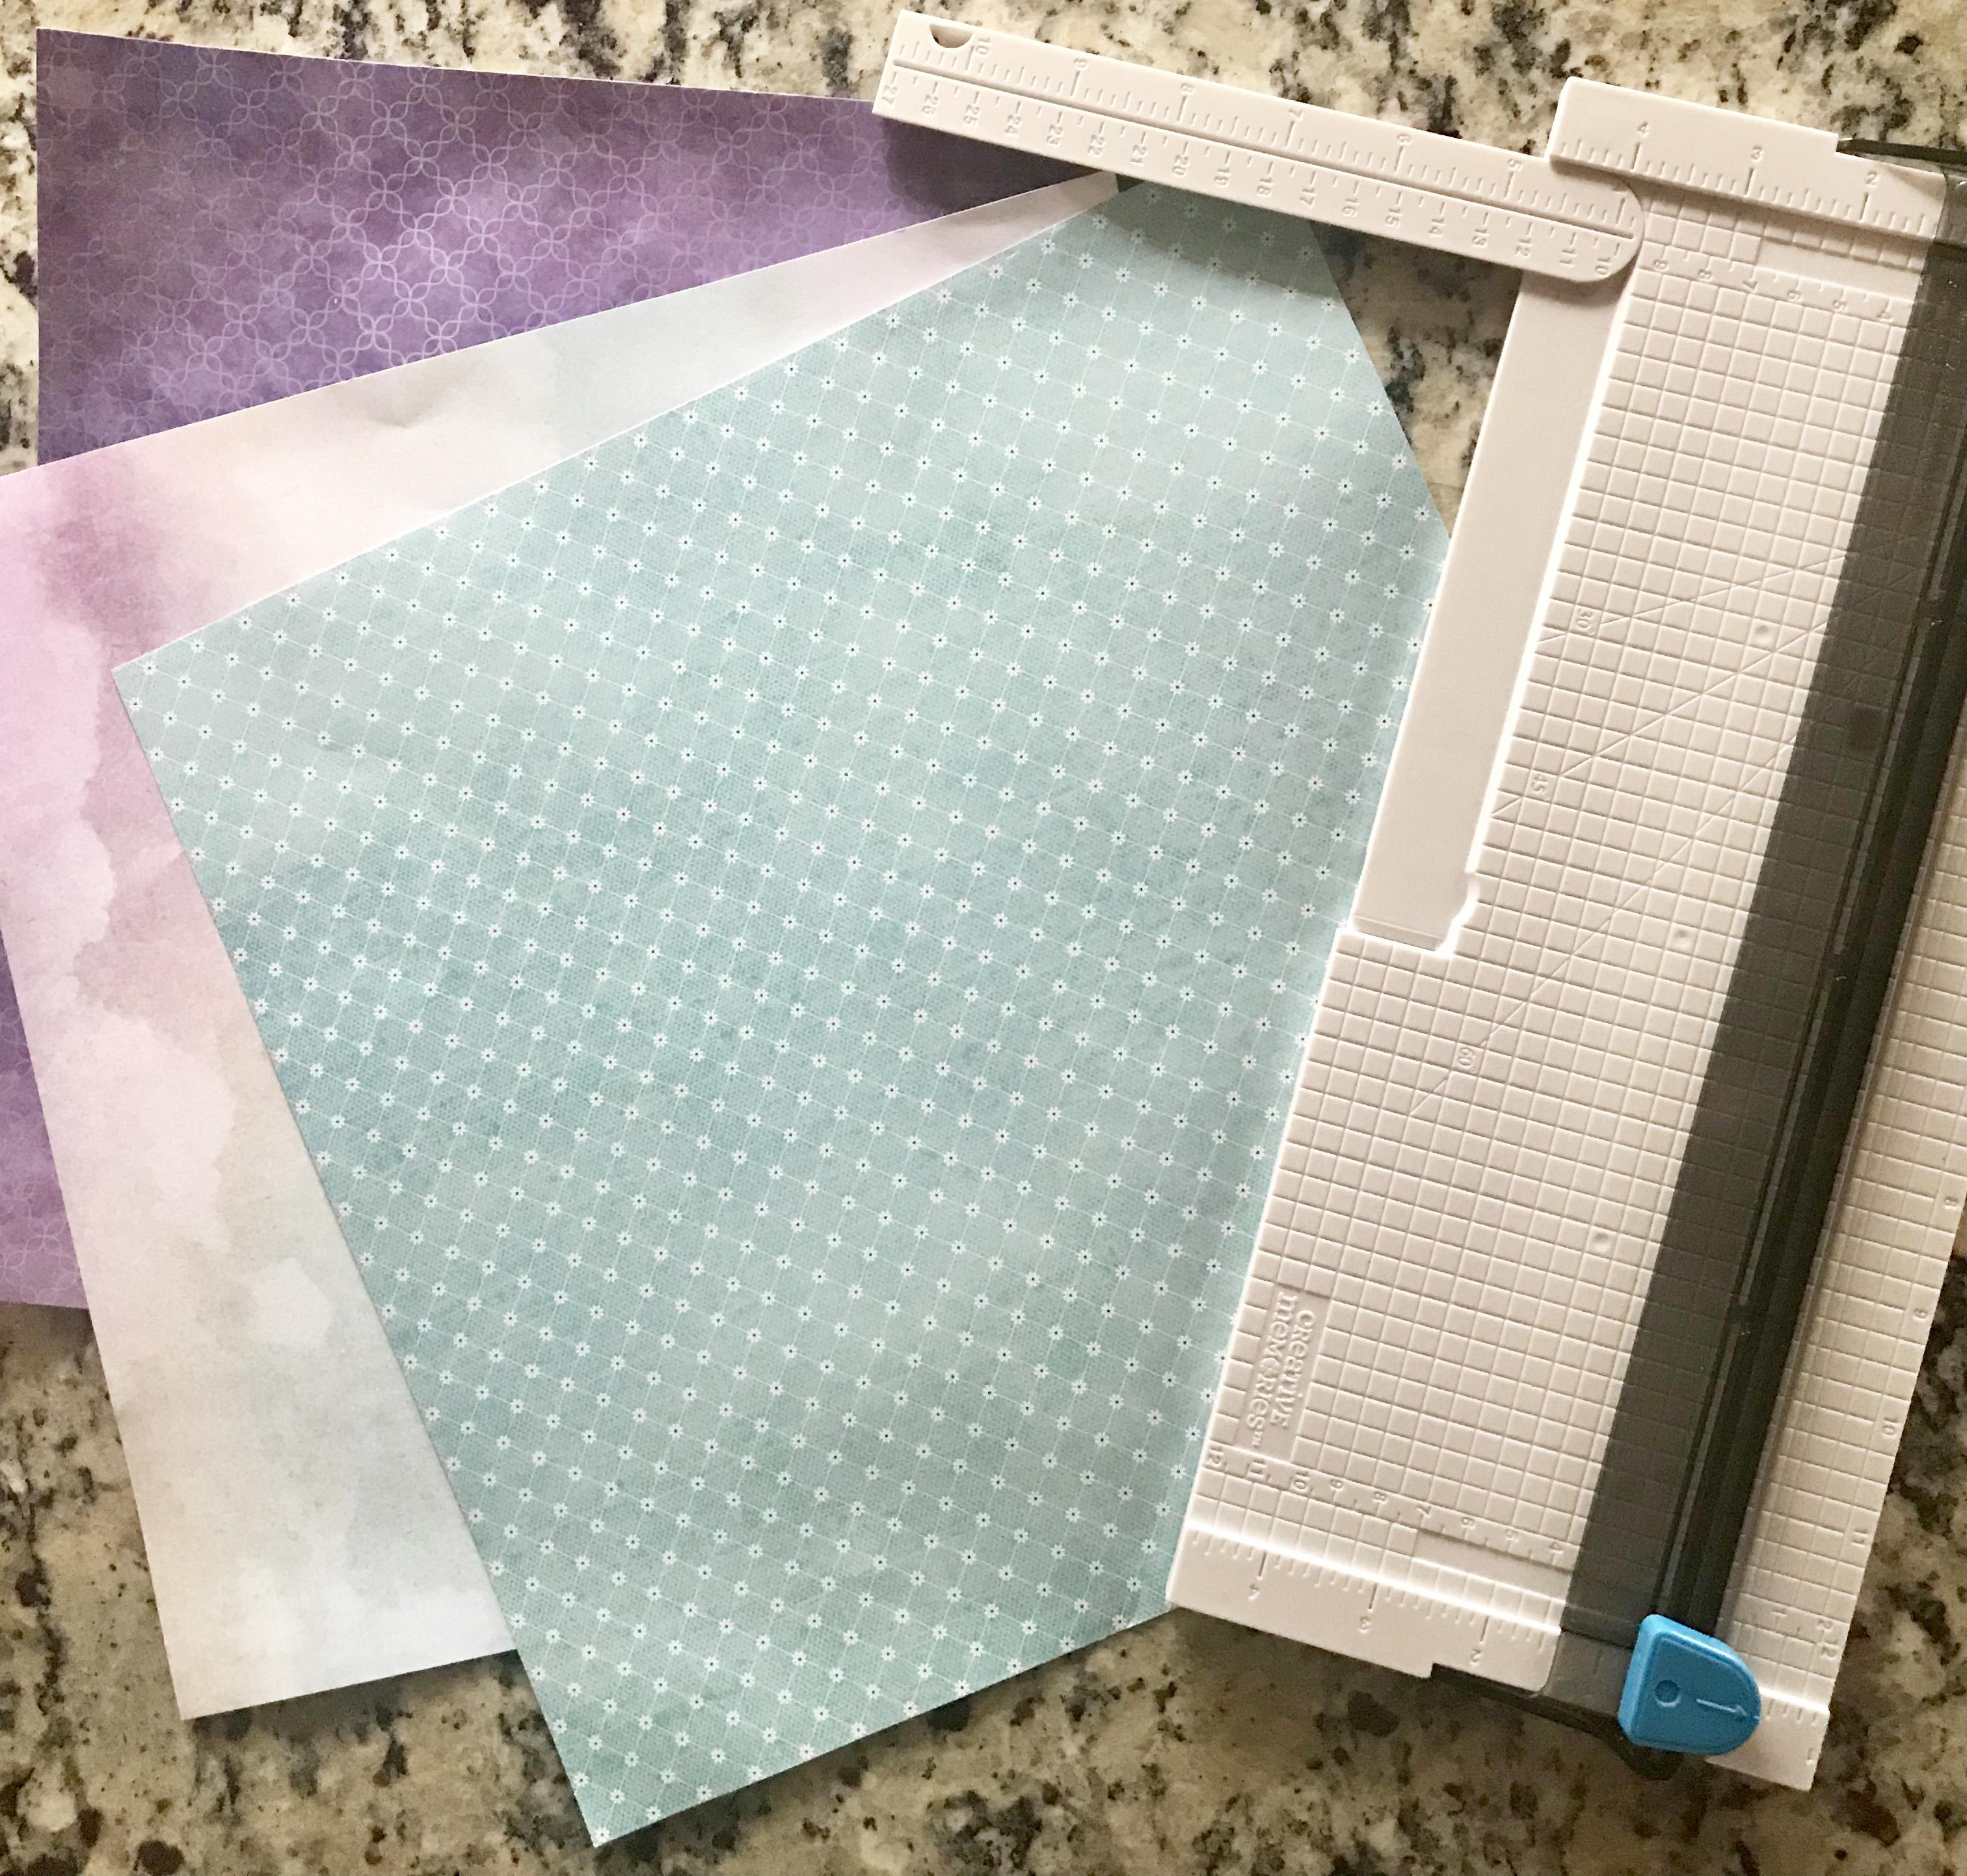 Secret-Garden-DIY-Paper-Craft-Butterfly-Creative-Memories